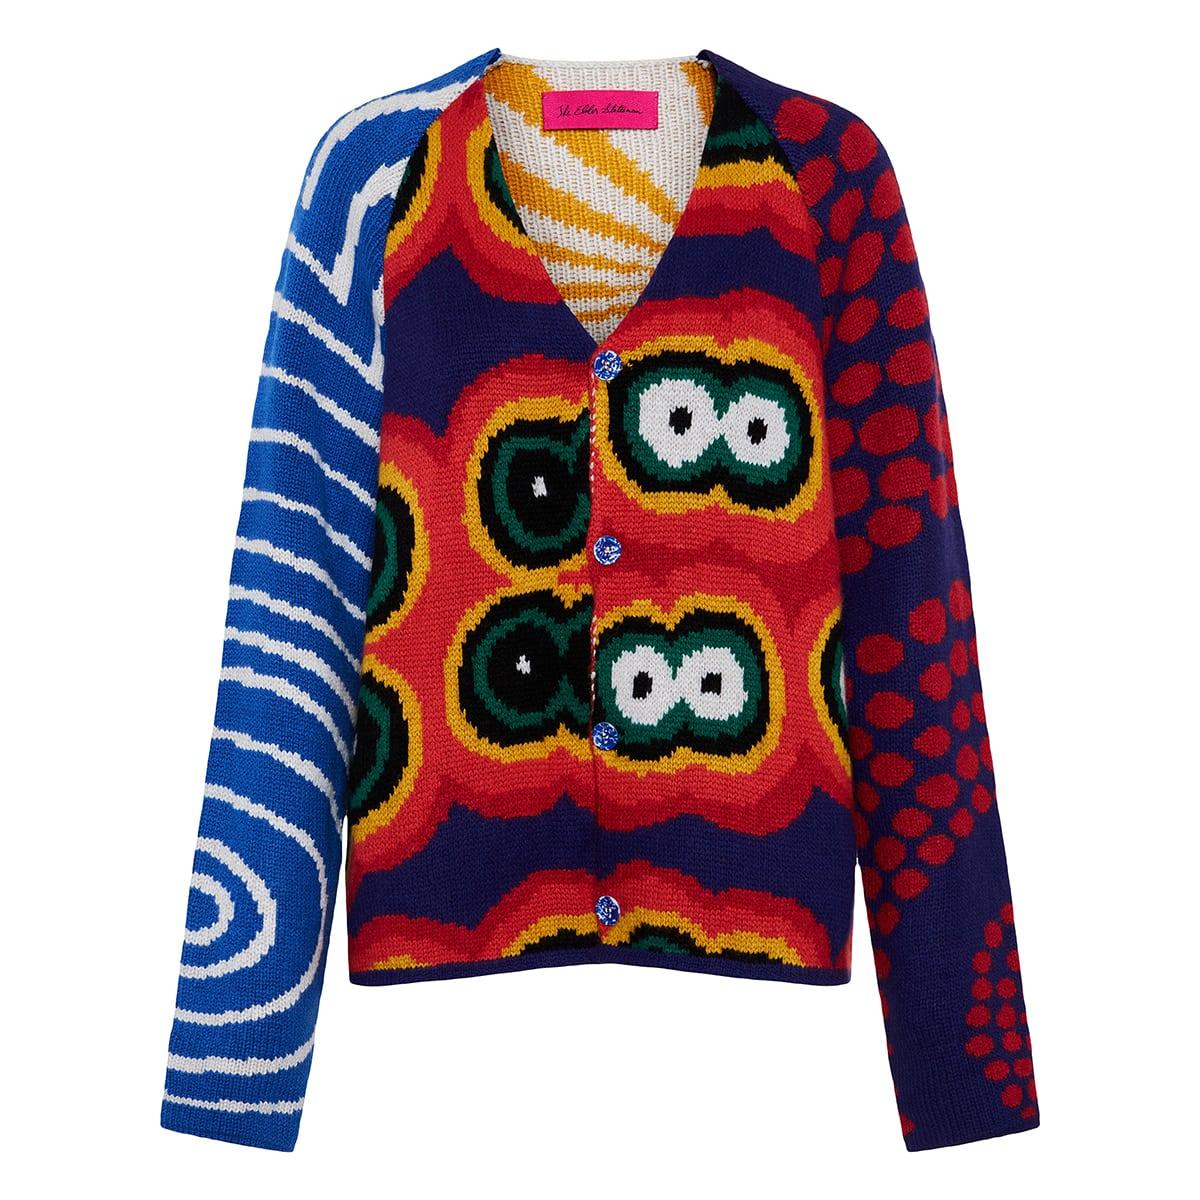 Thelma patchwork-print cashmere cardigan